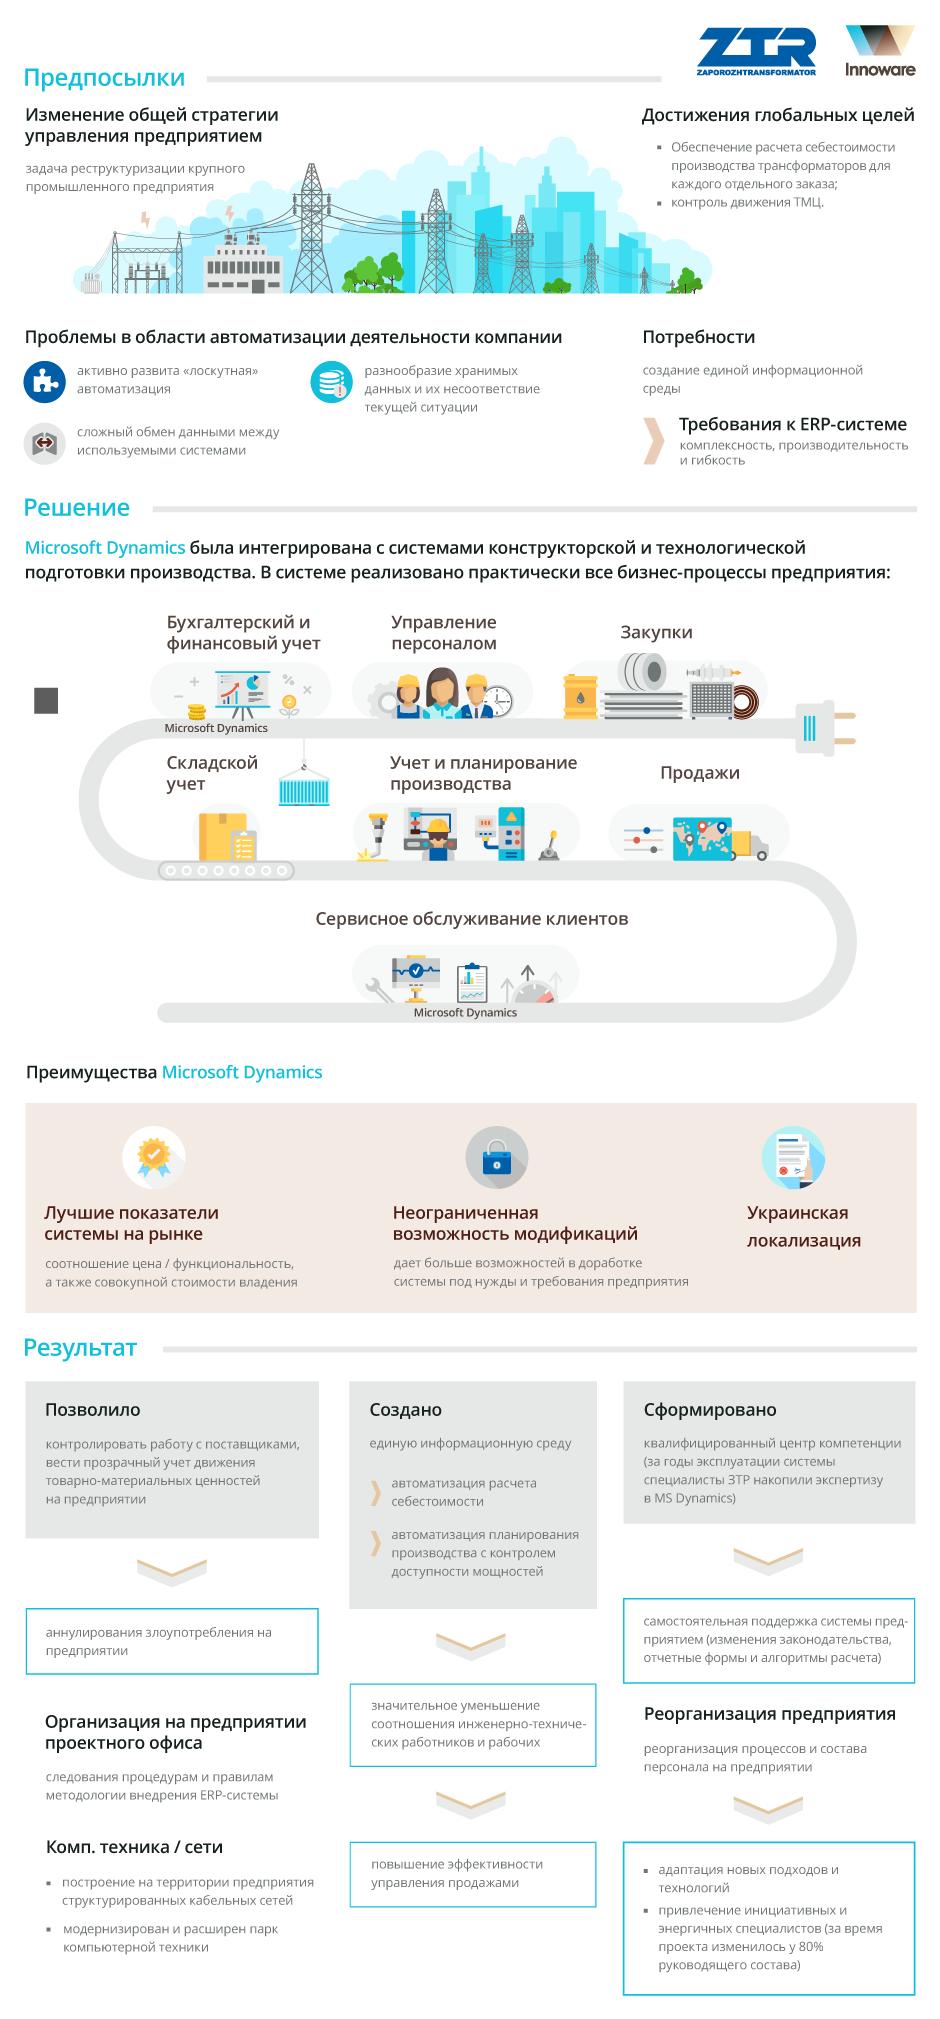 Внедрение Microsoft Dynamics AX в ЗАО «Запорожтрансформатор»